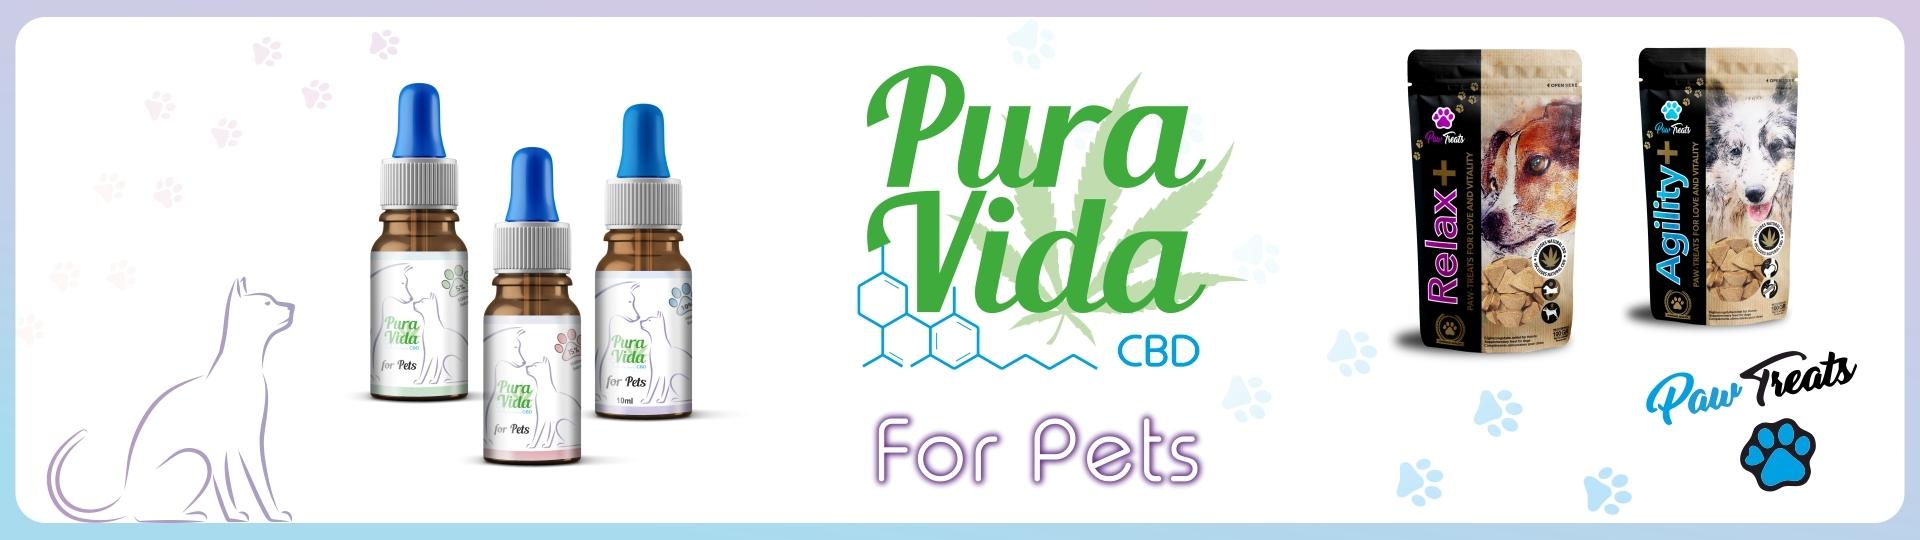 Pura Vida CBD For Pets